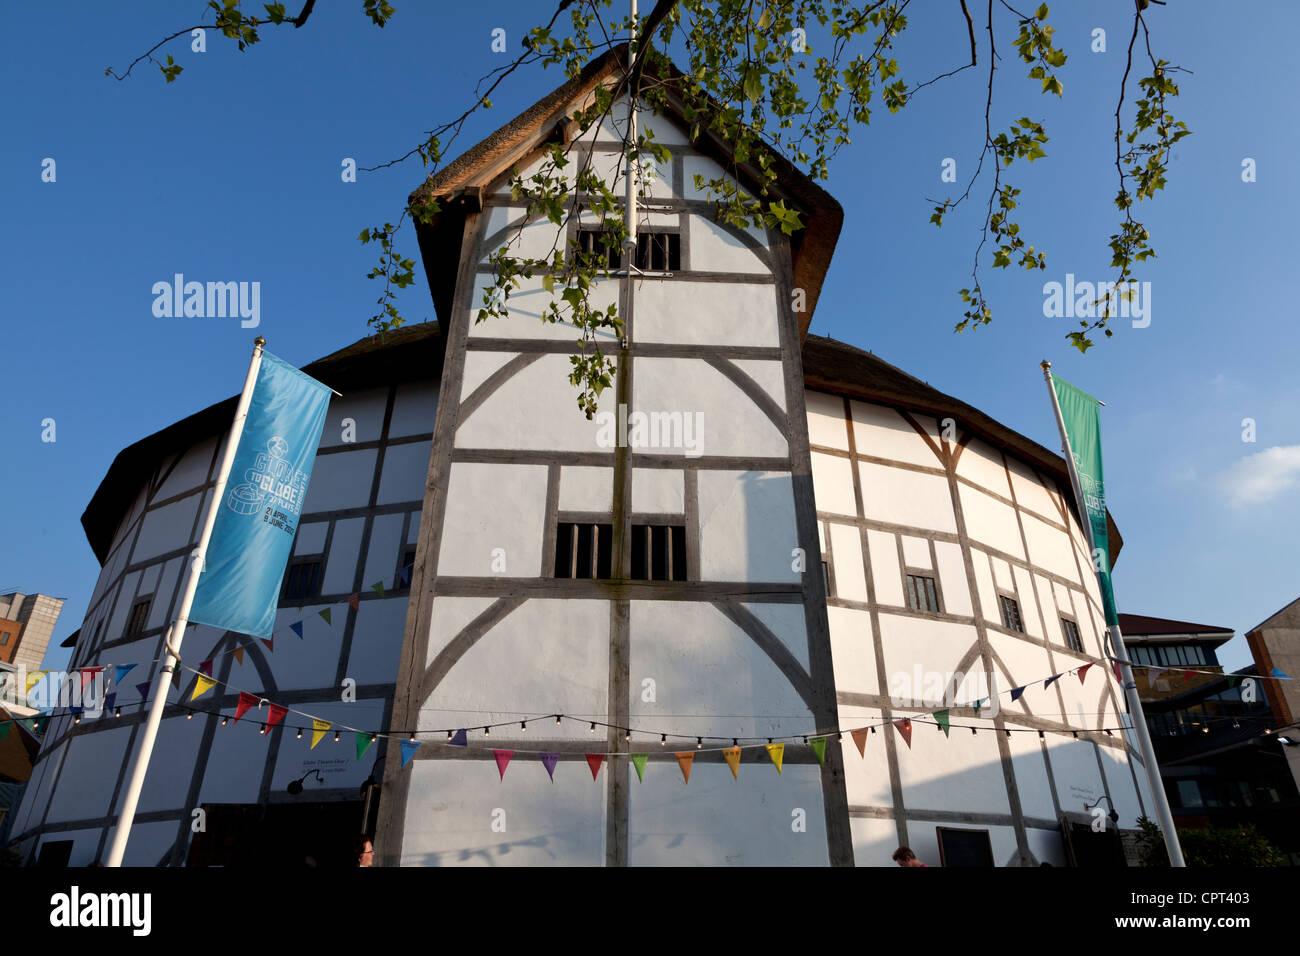 Shakespeare's Globe Theatre reconstruction, Southbank, London, England, UK. - Stock Image